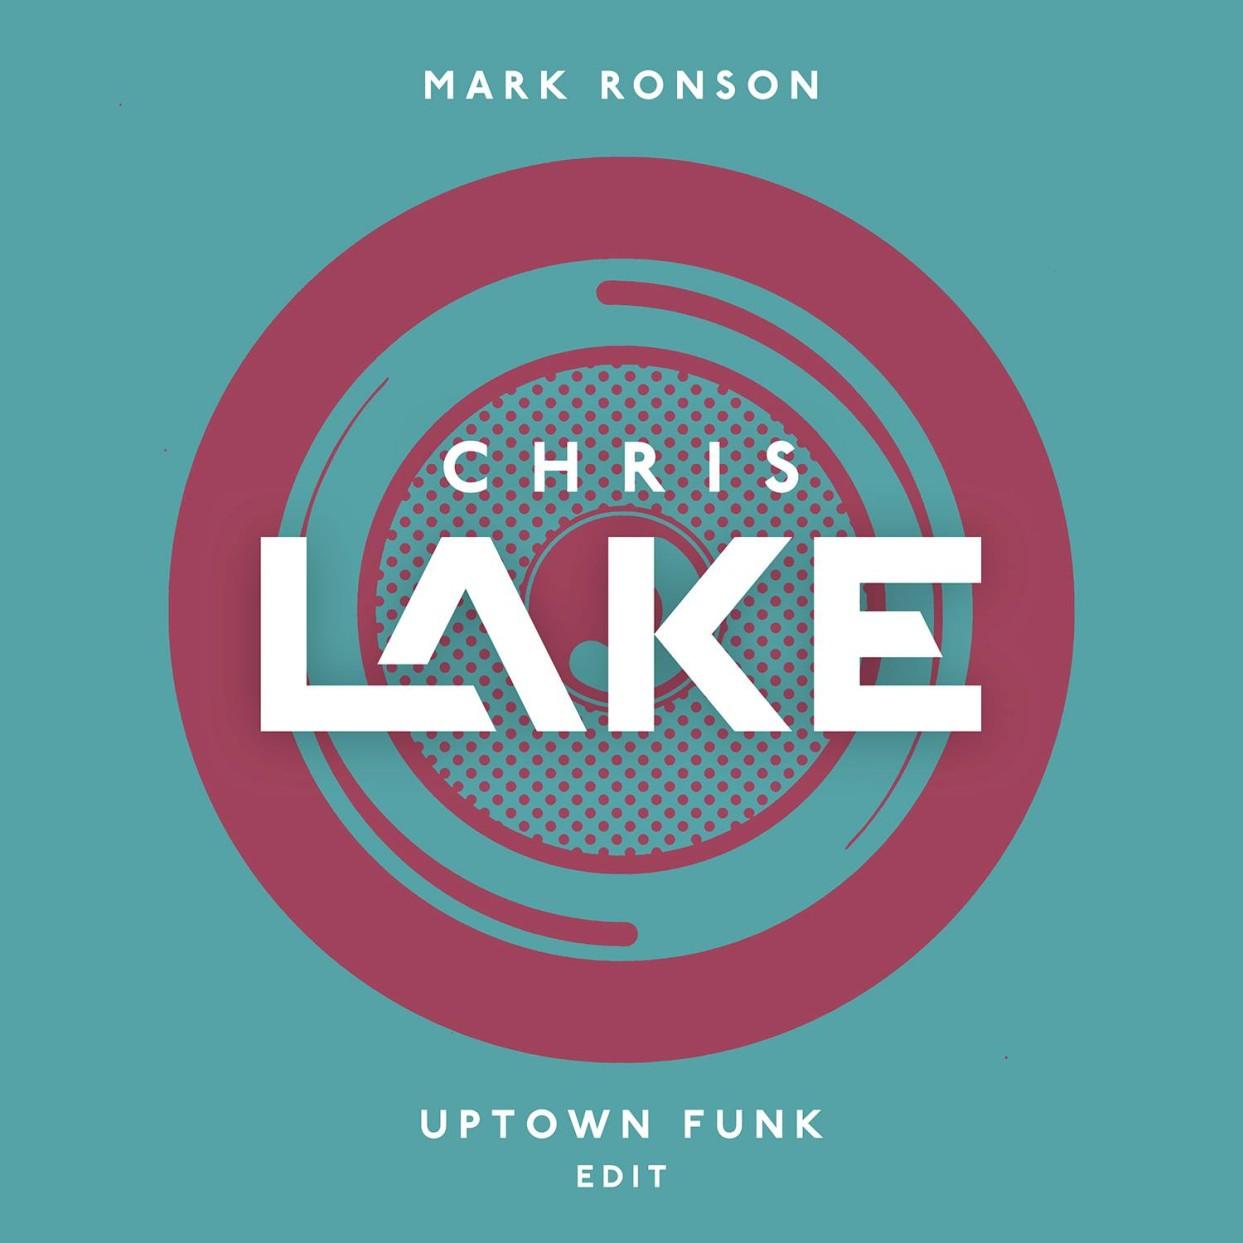 MARK RONSON – UPTOWN FUNK (CHRIS LAKE EDIT)